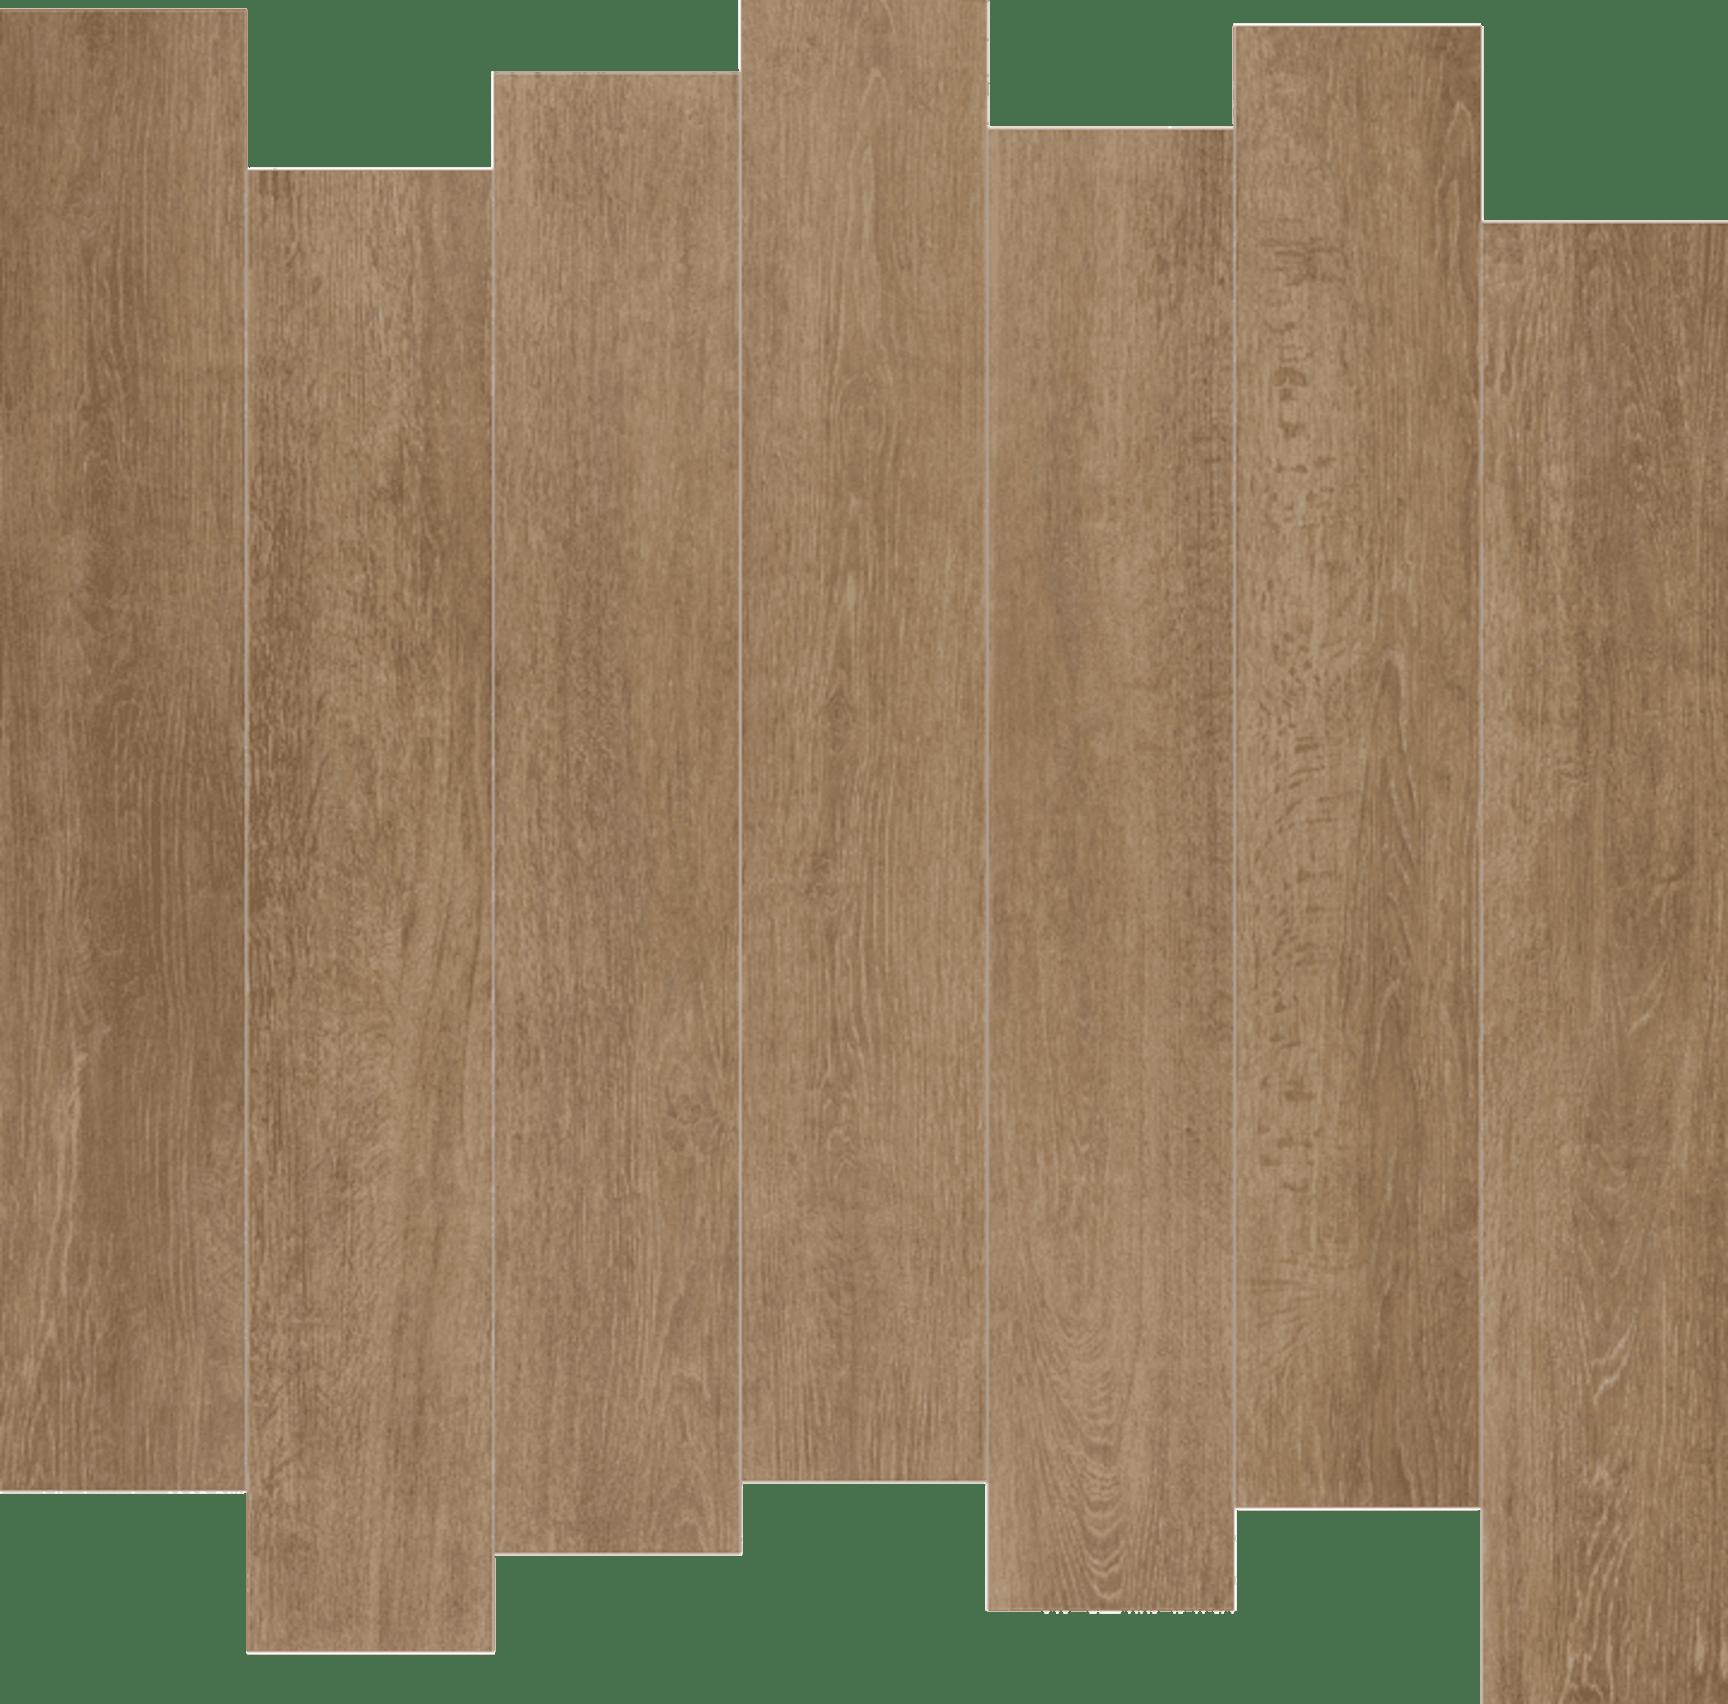 Lucca Warm Oak Tile Finish